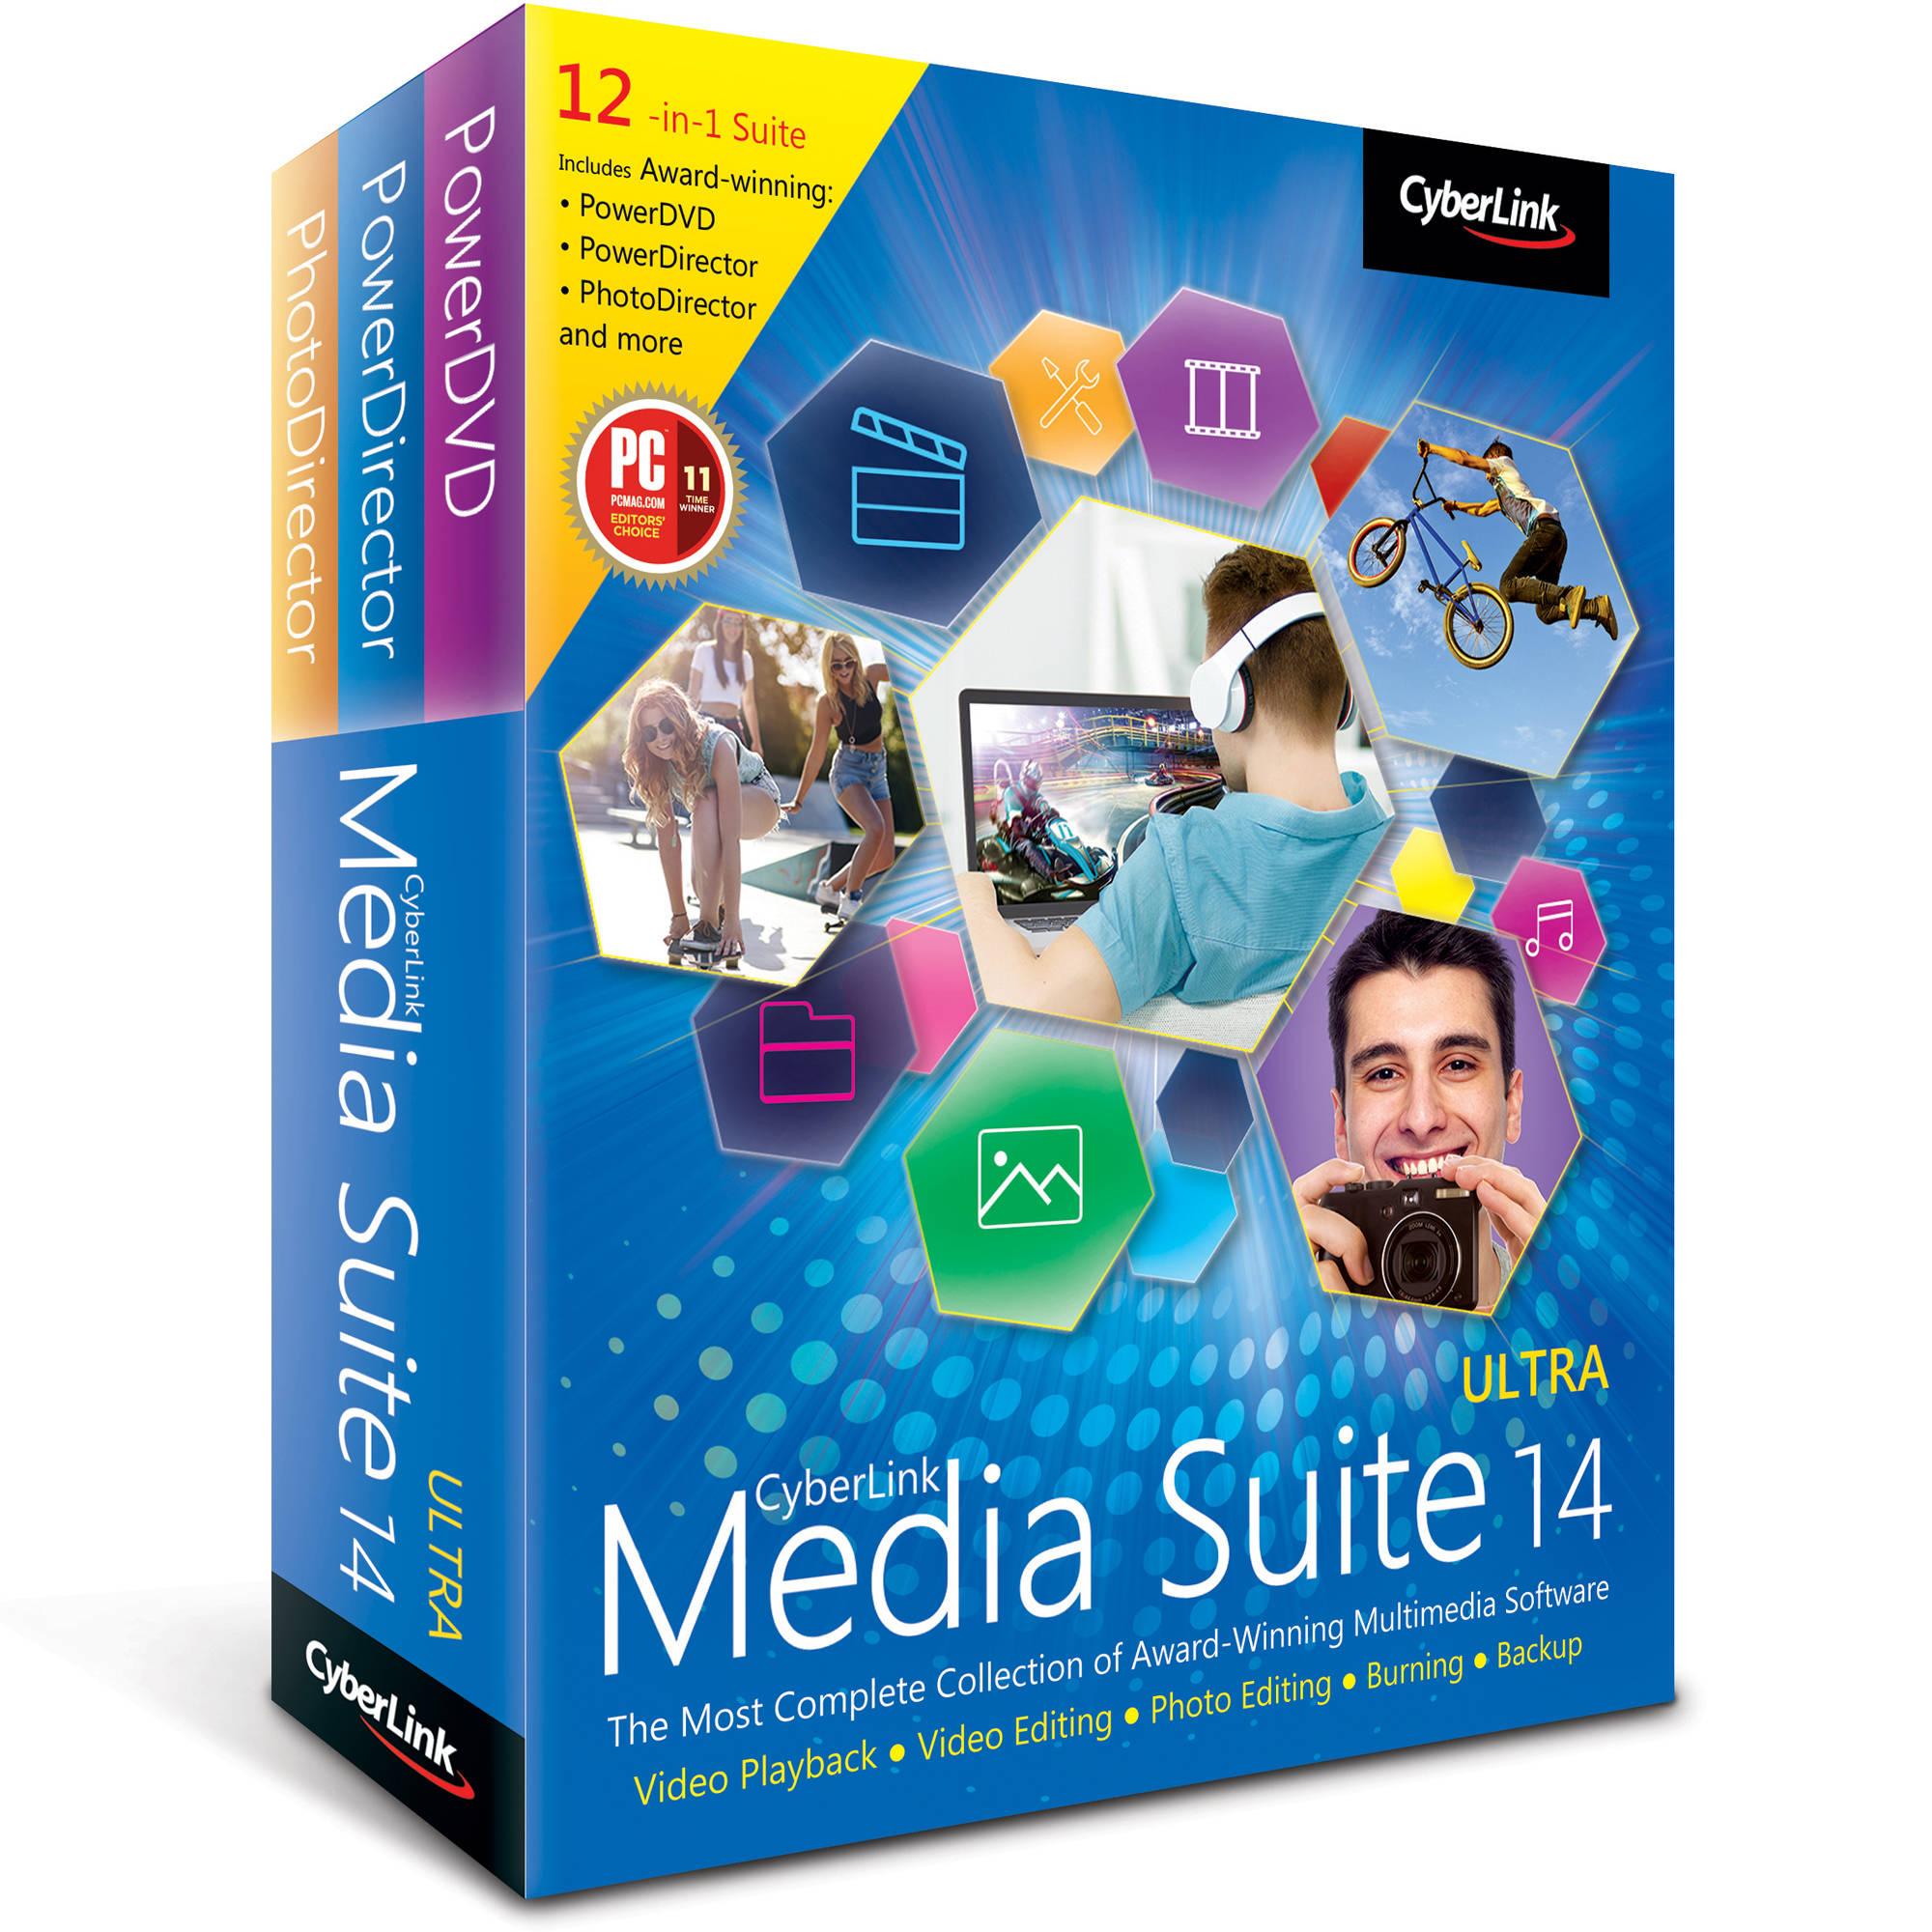 cyberlink media suite 8 free download